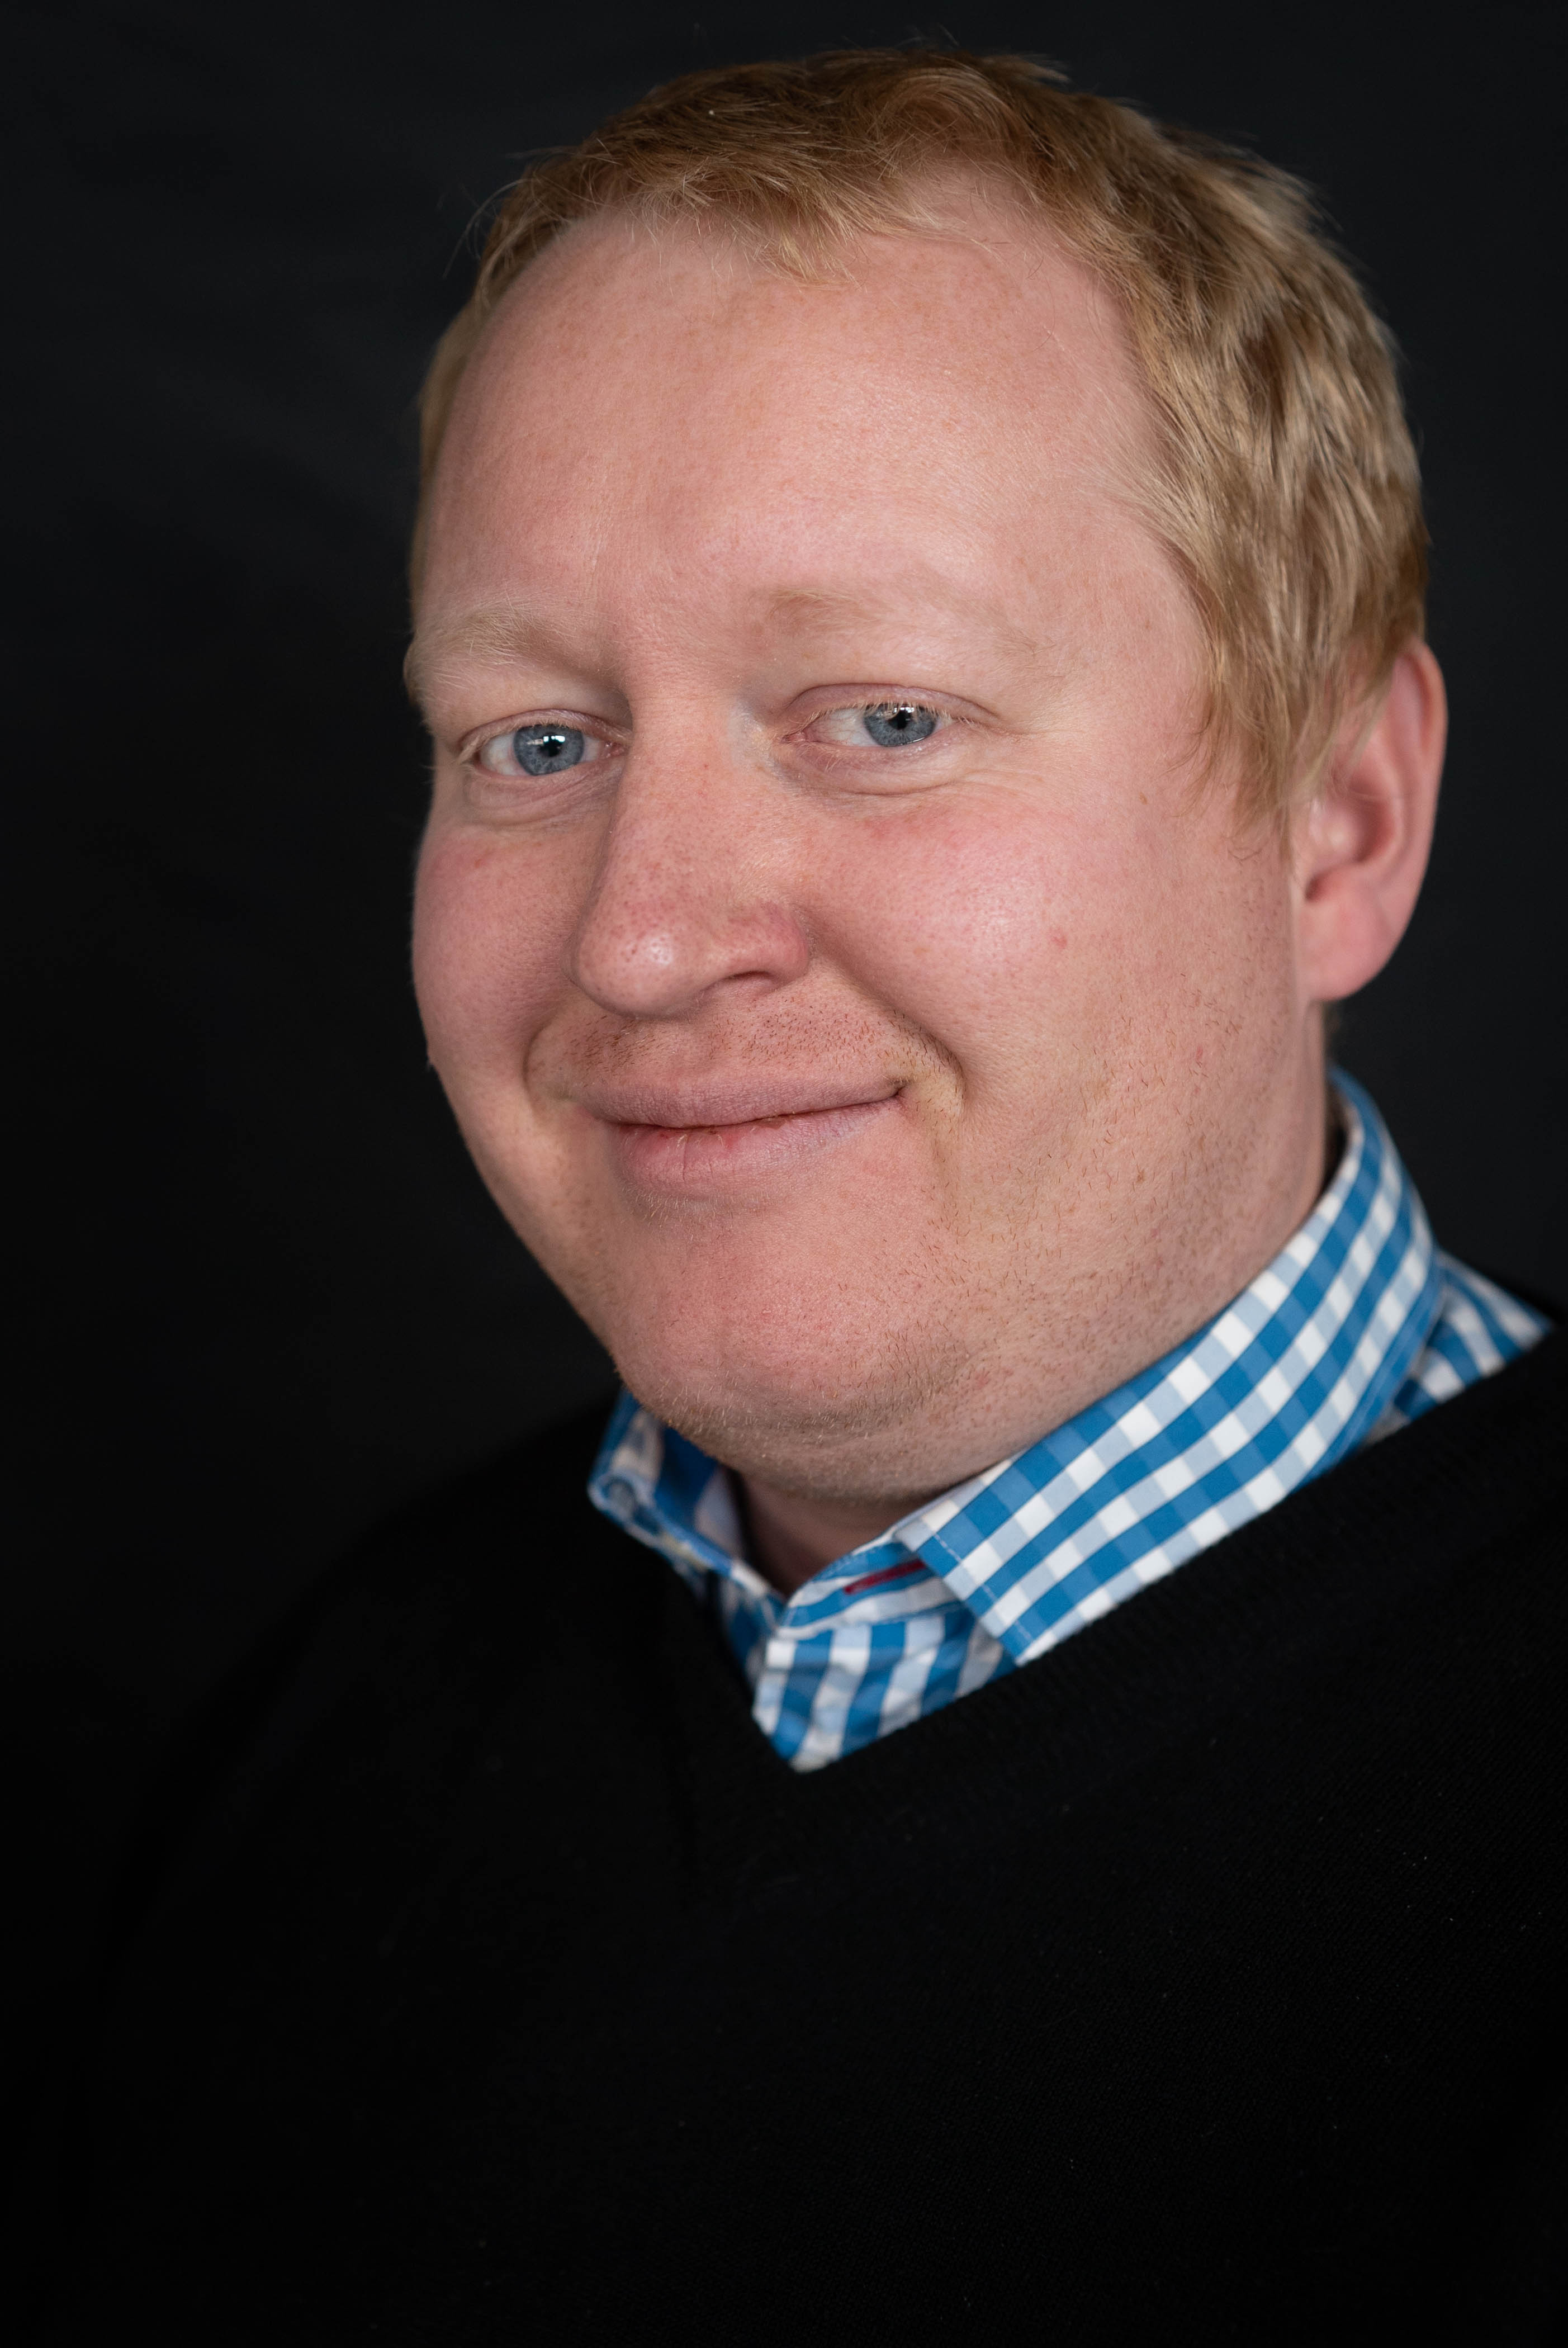 Simon Høegh Jensen (SHJ)